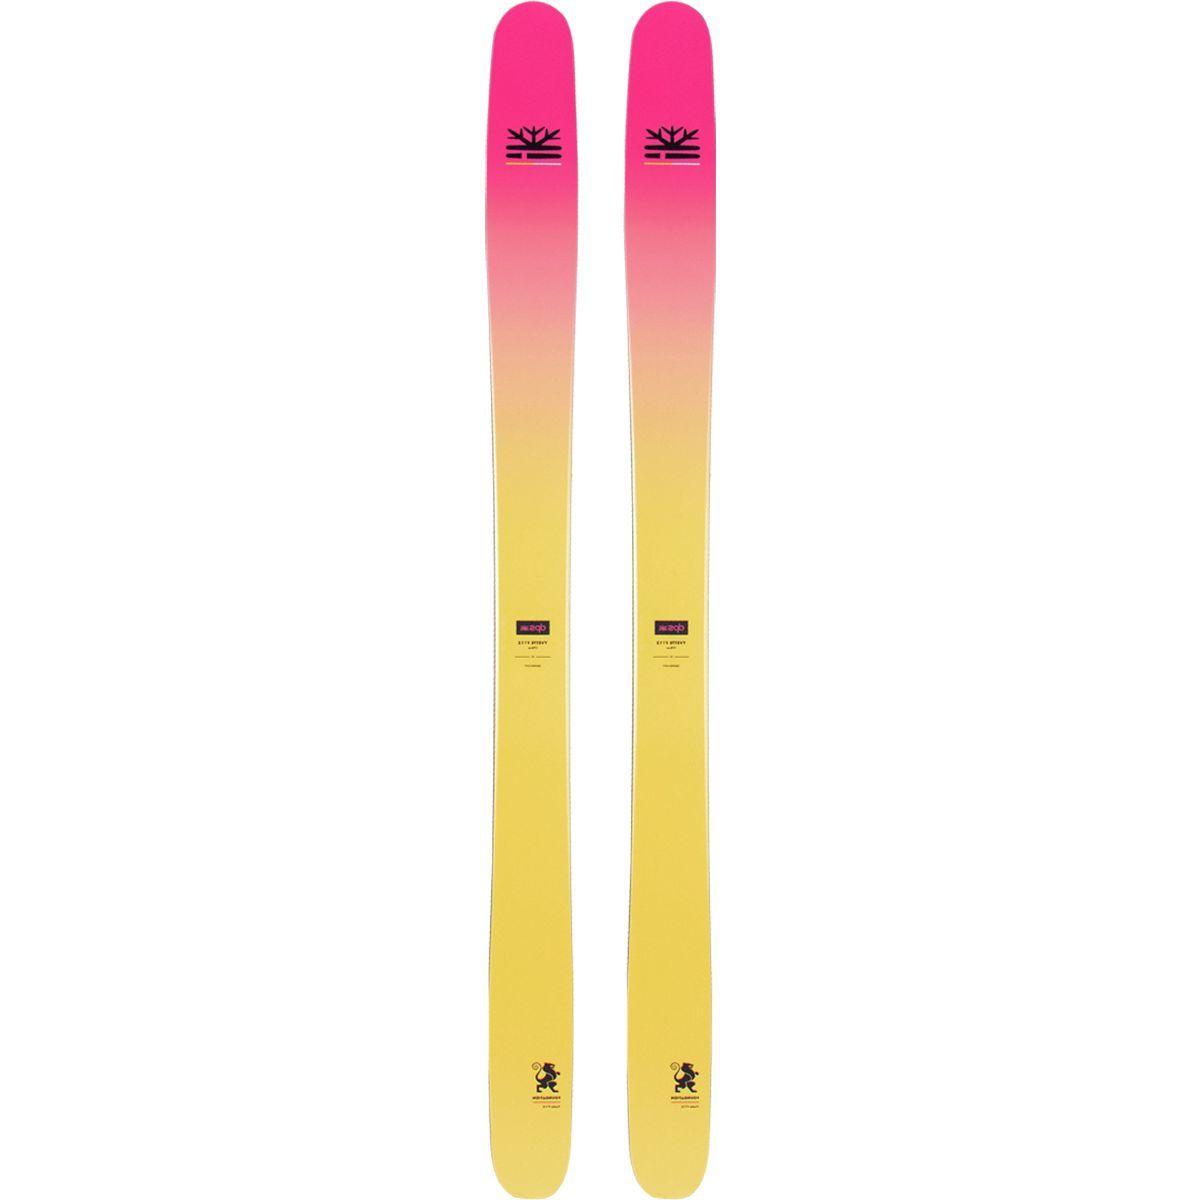 DPS Skis Yvette 112 Foundation Ski - Women's